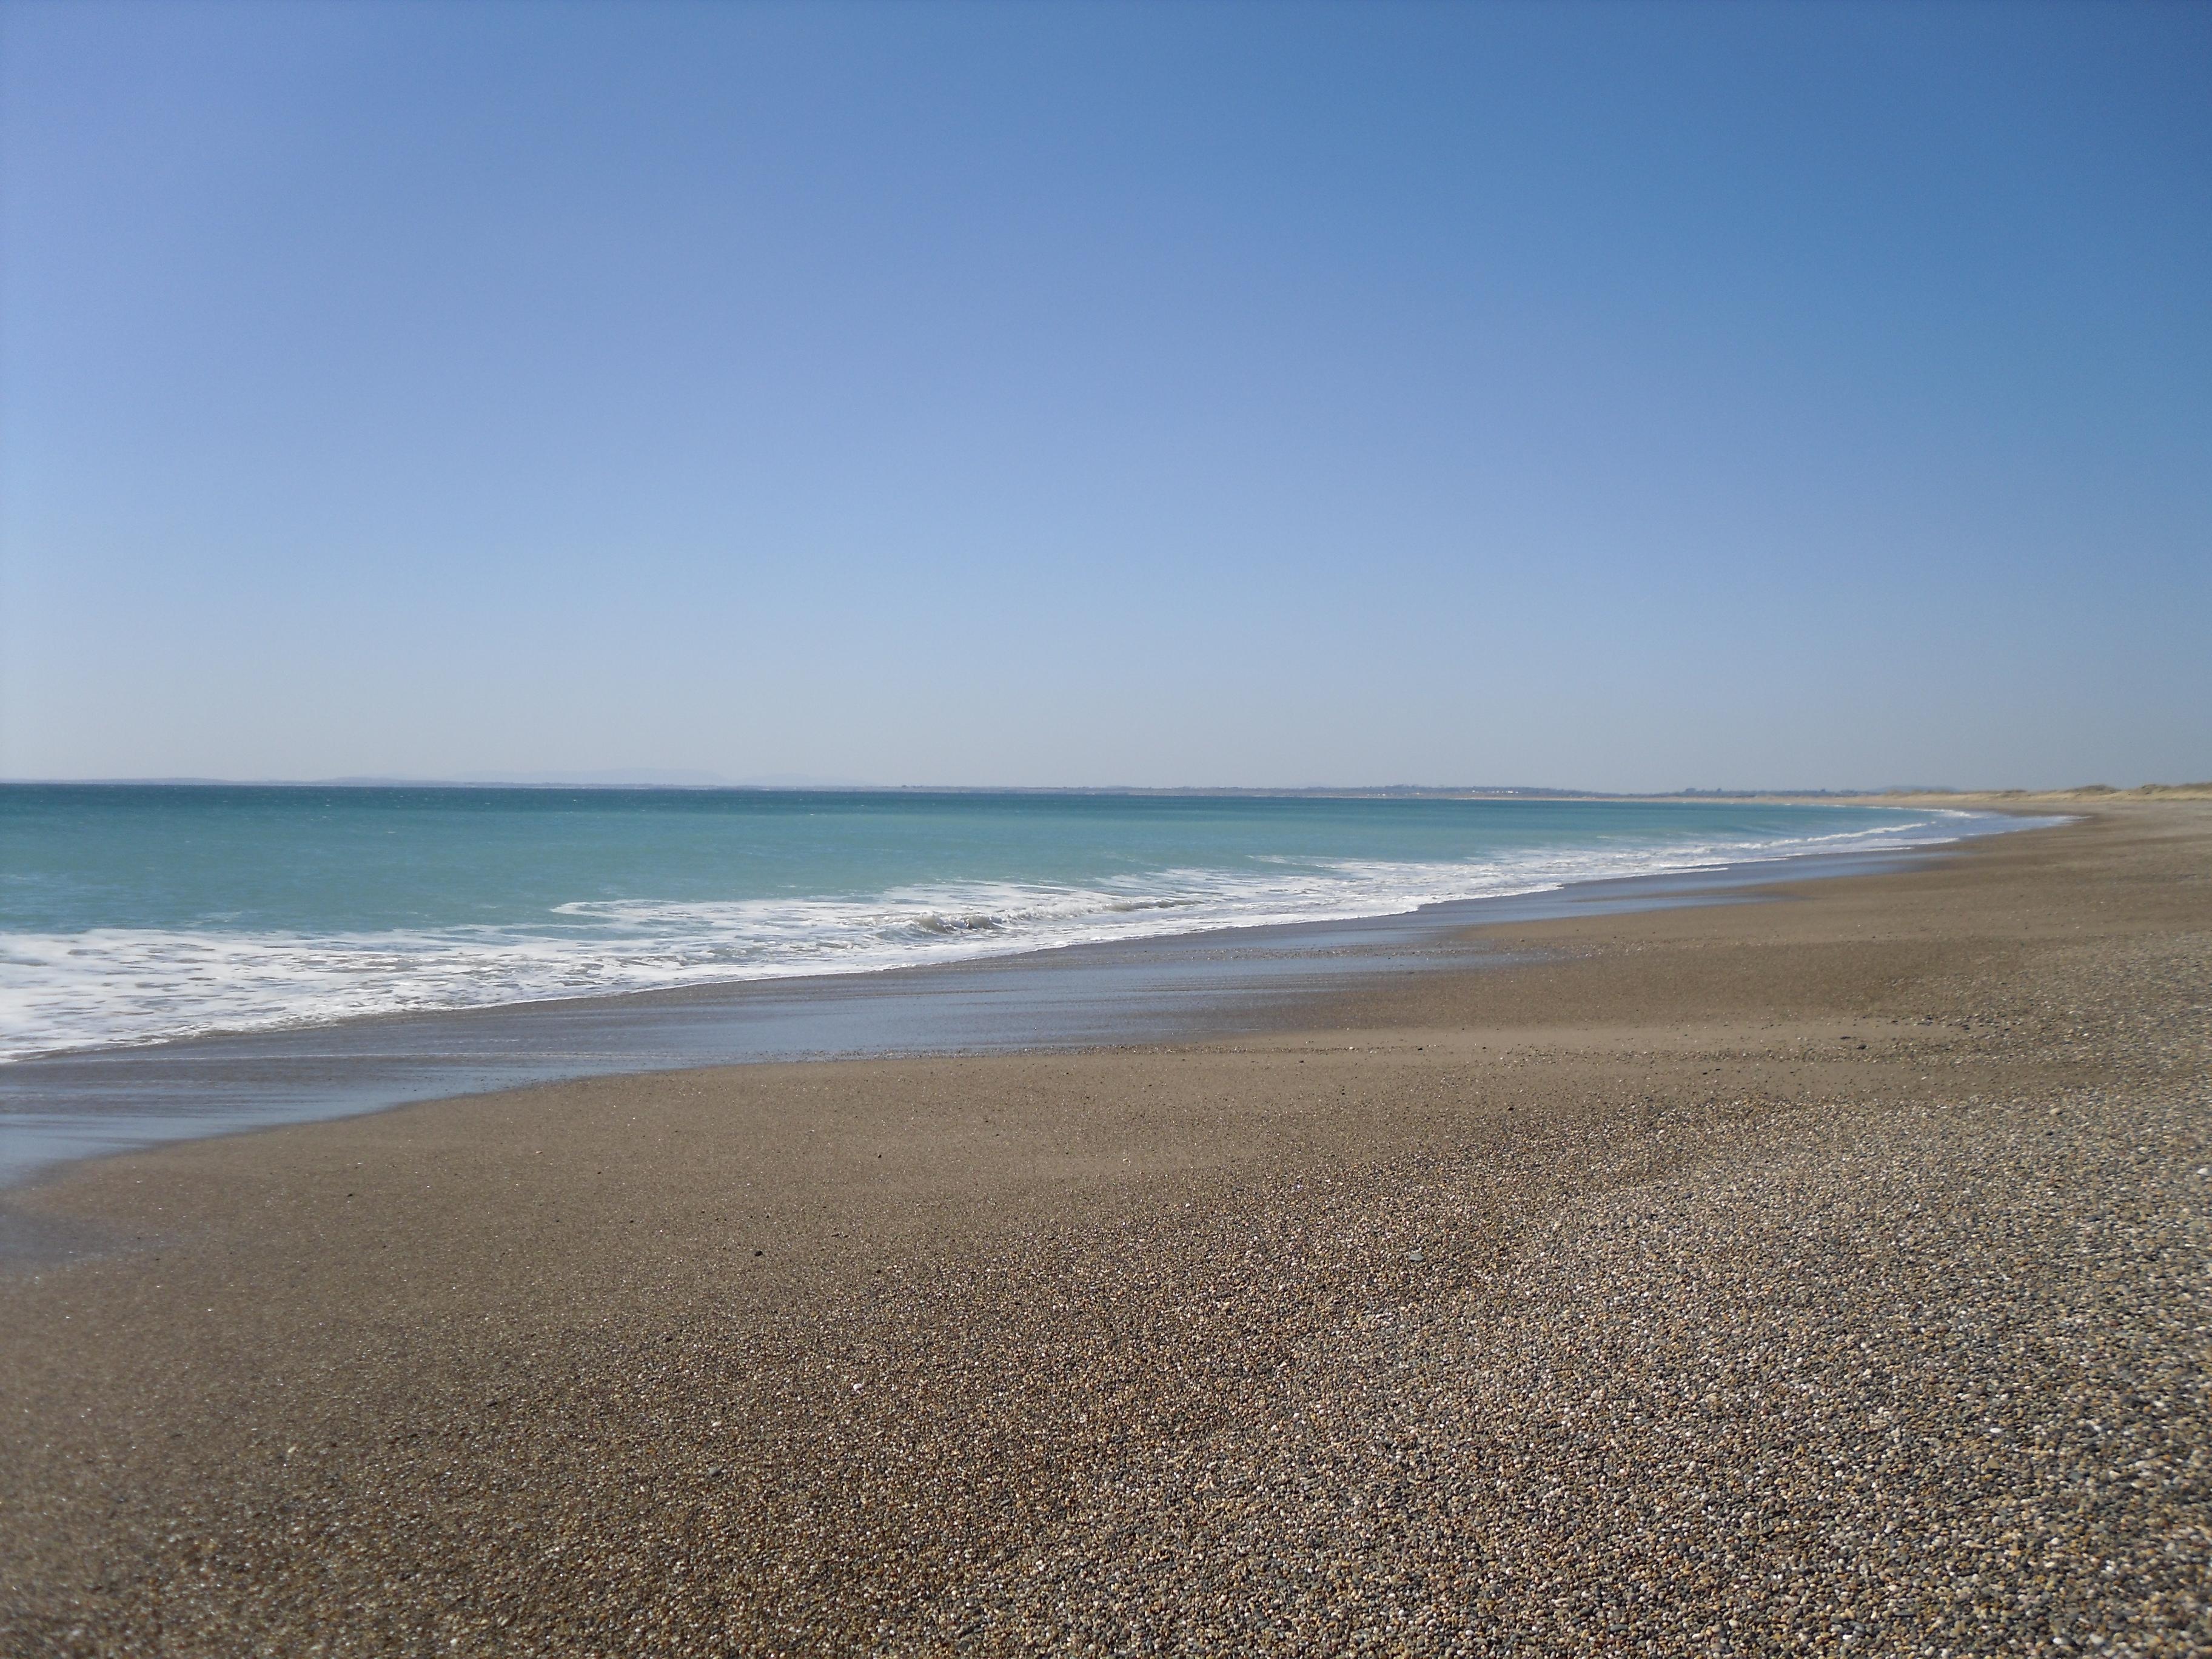 Beach, Sand, Sea, Sky, Water, HQ Photo